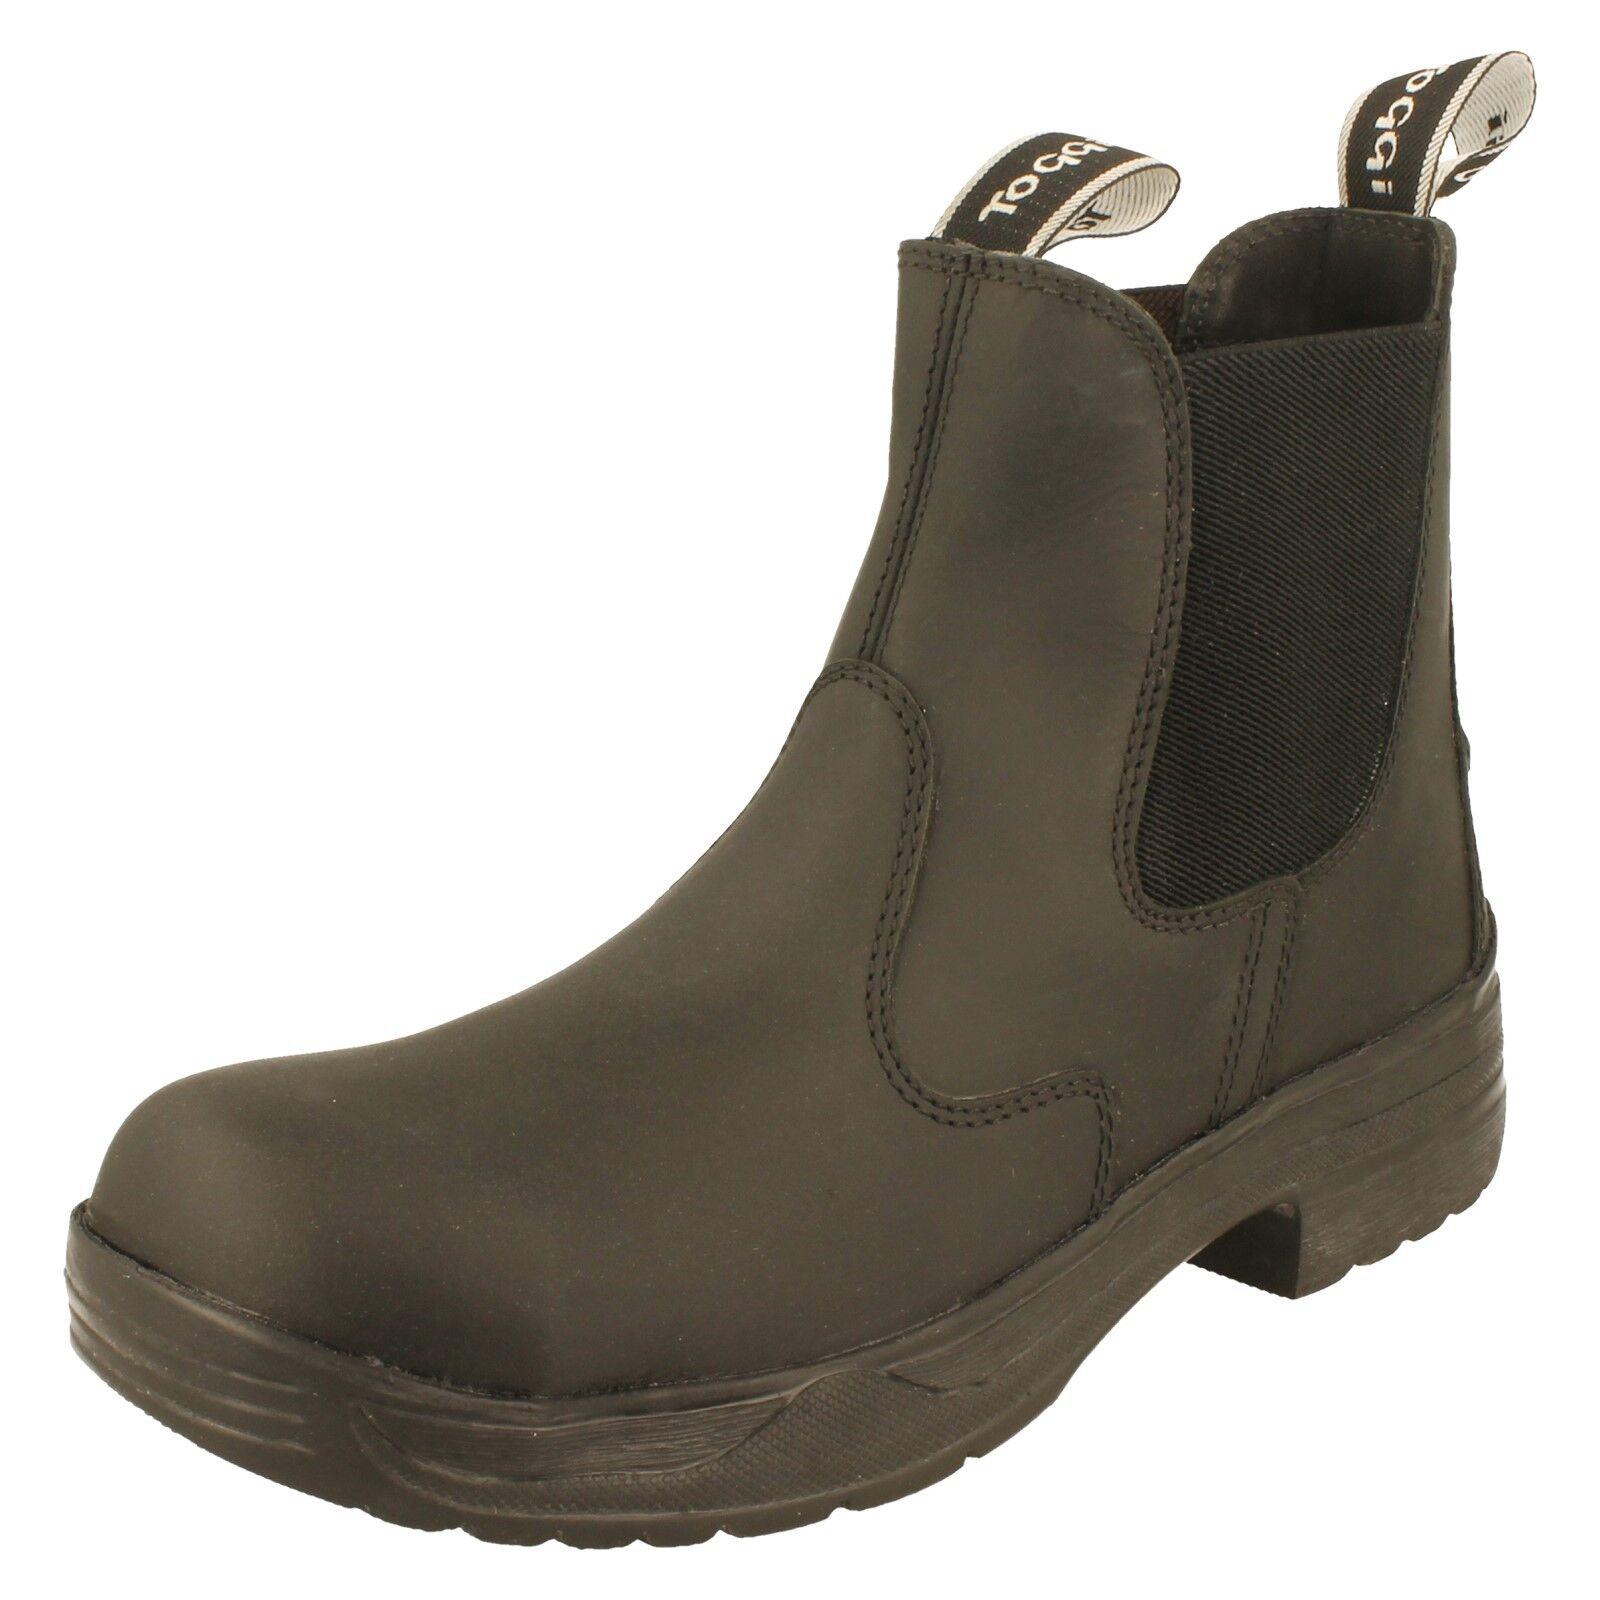 HombreToggi Protective Jodphur botas - Kodiac Kodiac Kodiac 22b933